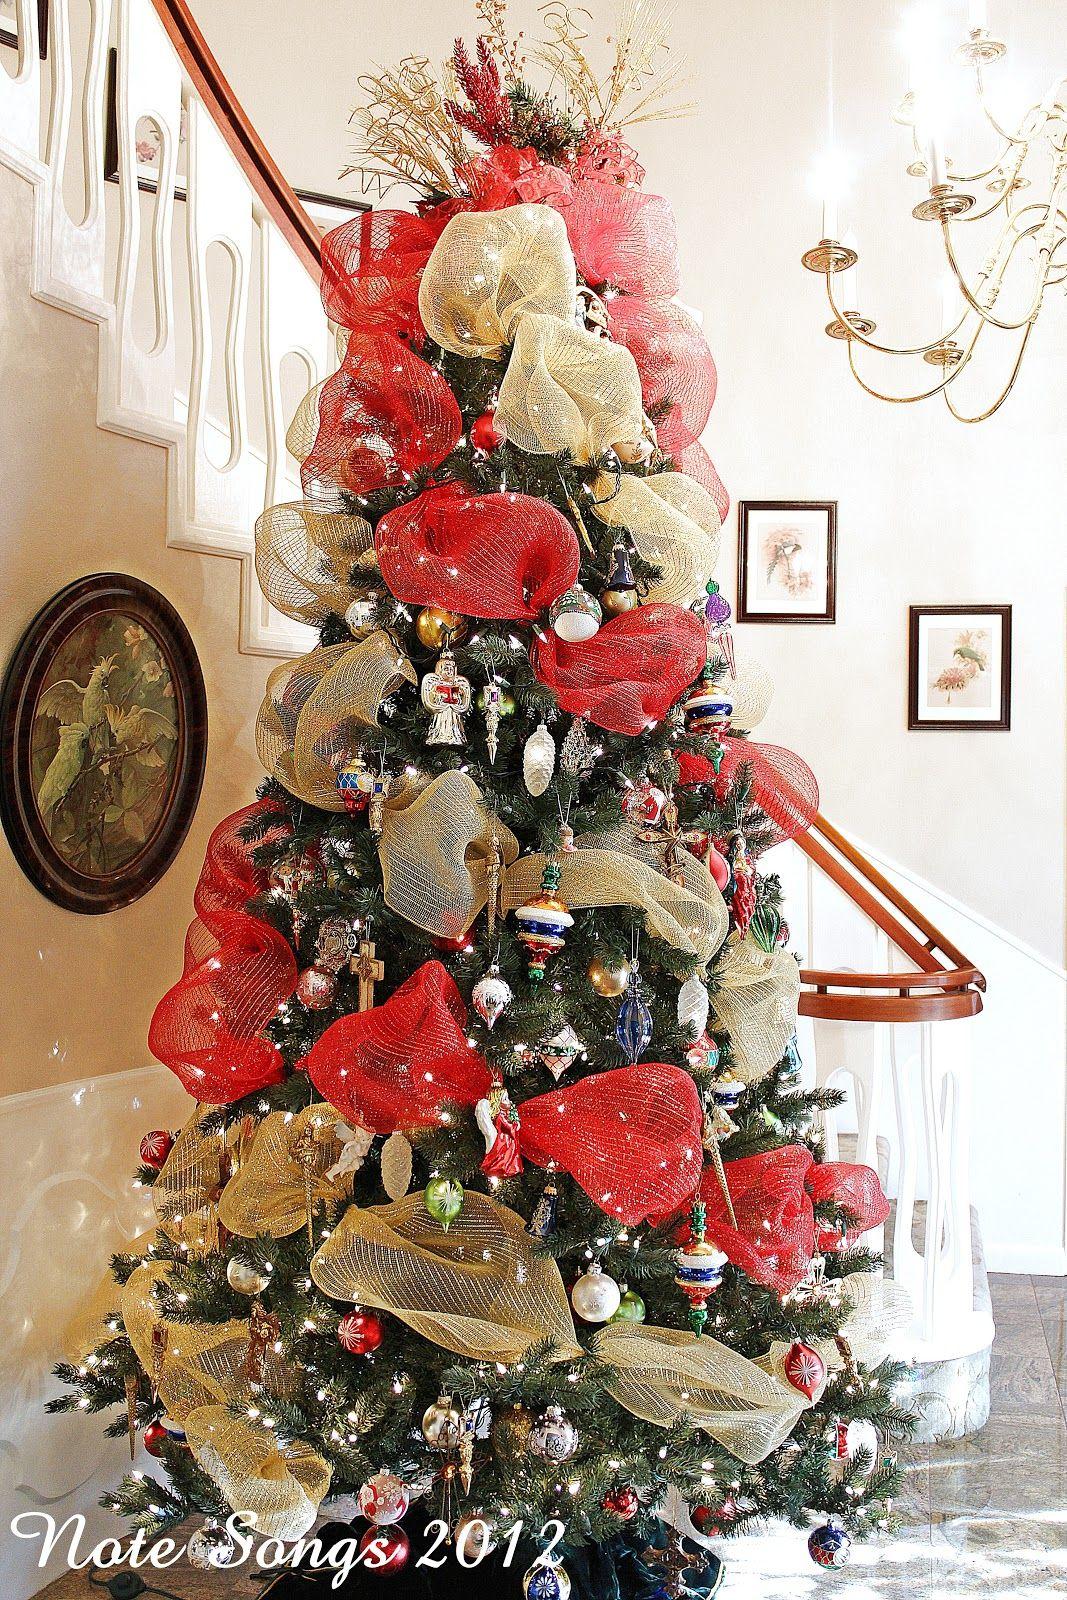 Deco Mesh Christmas Tree Xmas Pinterest Deco Mesh Mesh Christmas Tree And Mesh Ribbon On Christmas Tree Mesh Christmas Tree Xmas Decorations